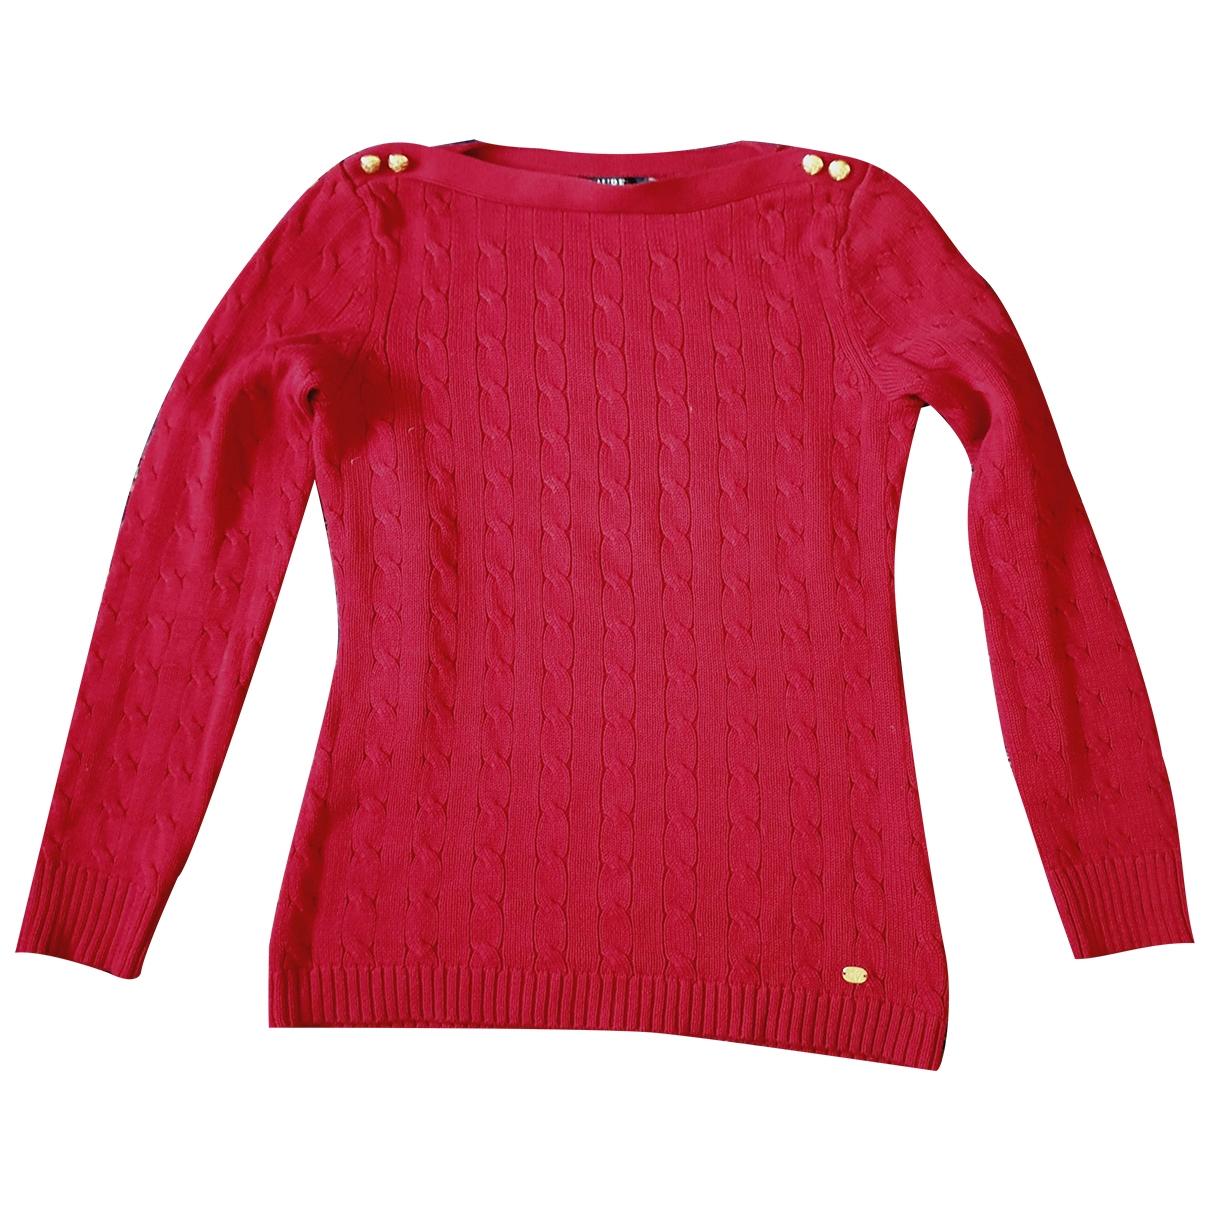 Lauren Ralph Lauren \N Red Cotton Knitwear for Women M International